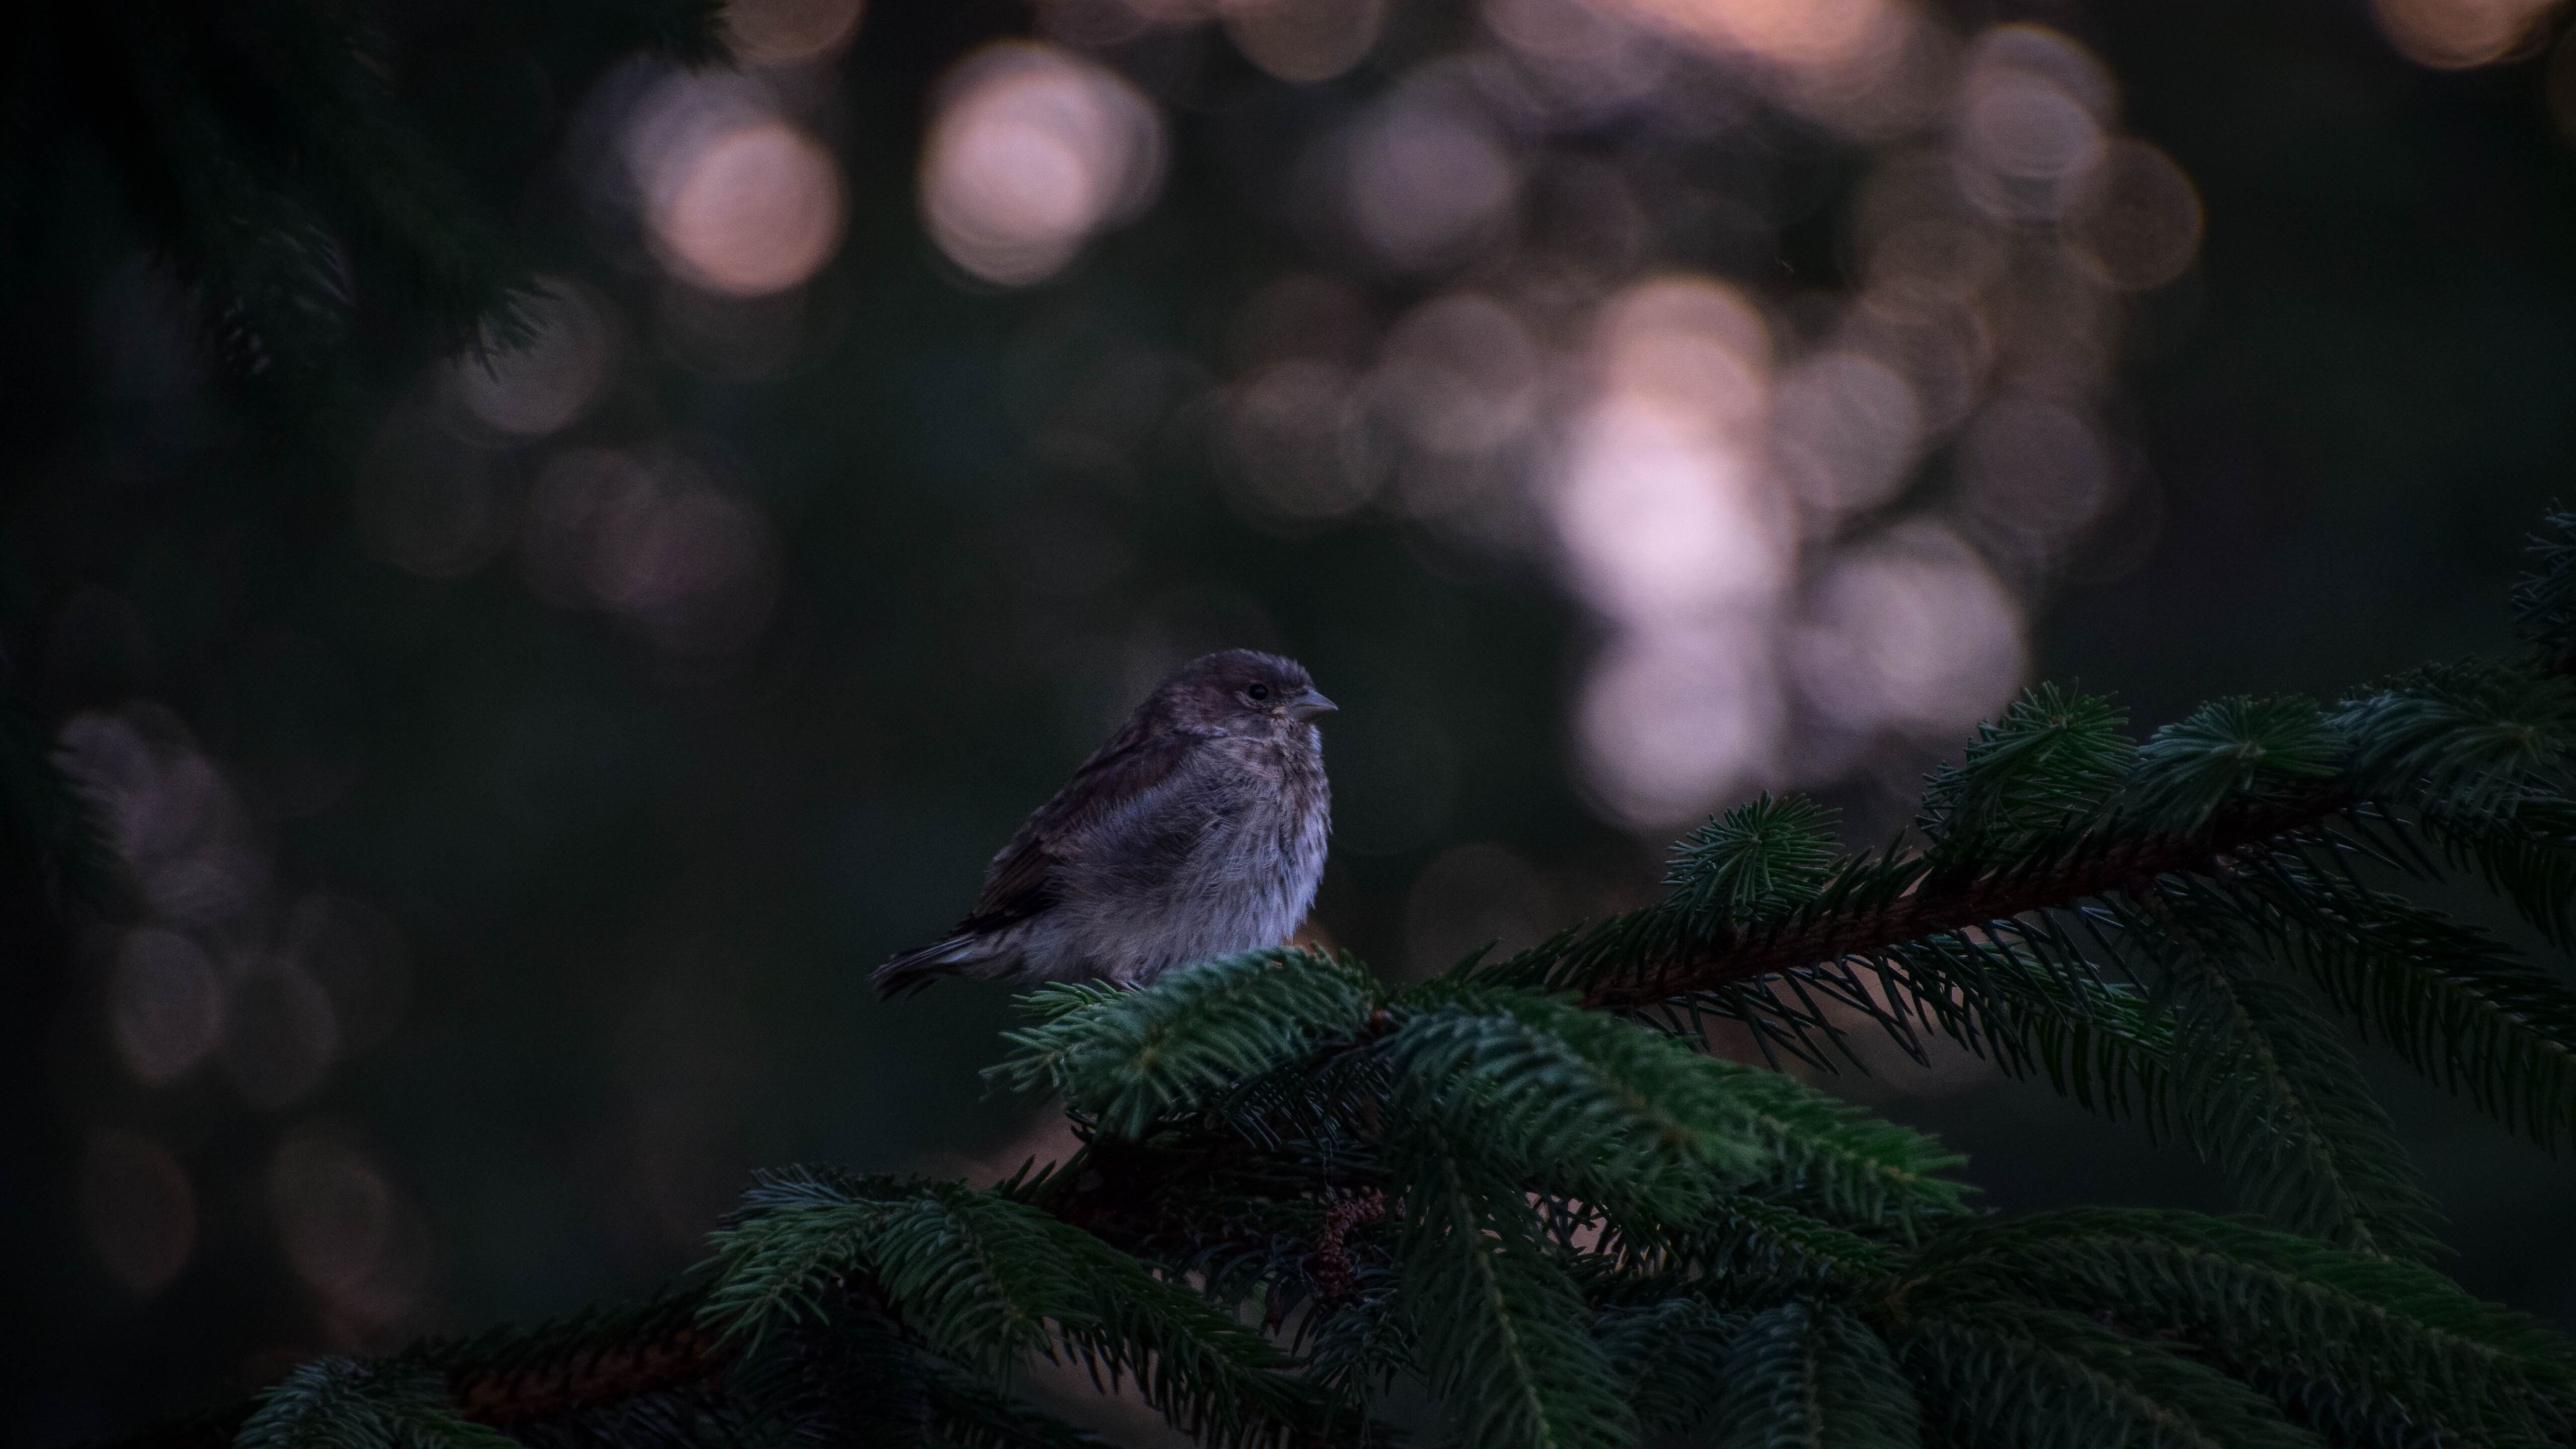 little-bird-in-forest-5t.jpg